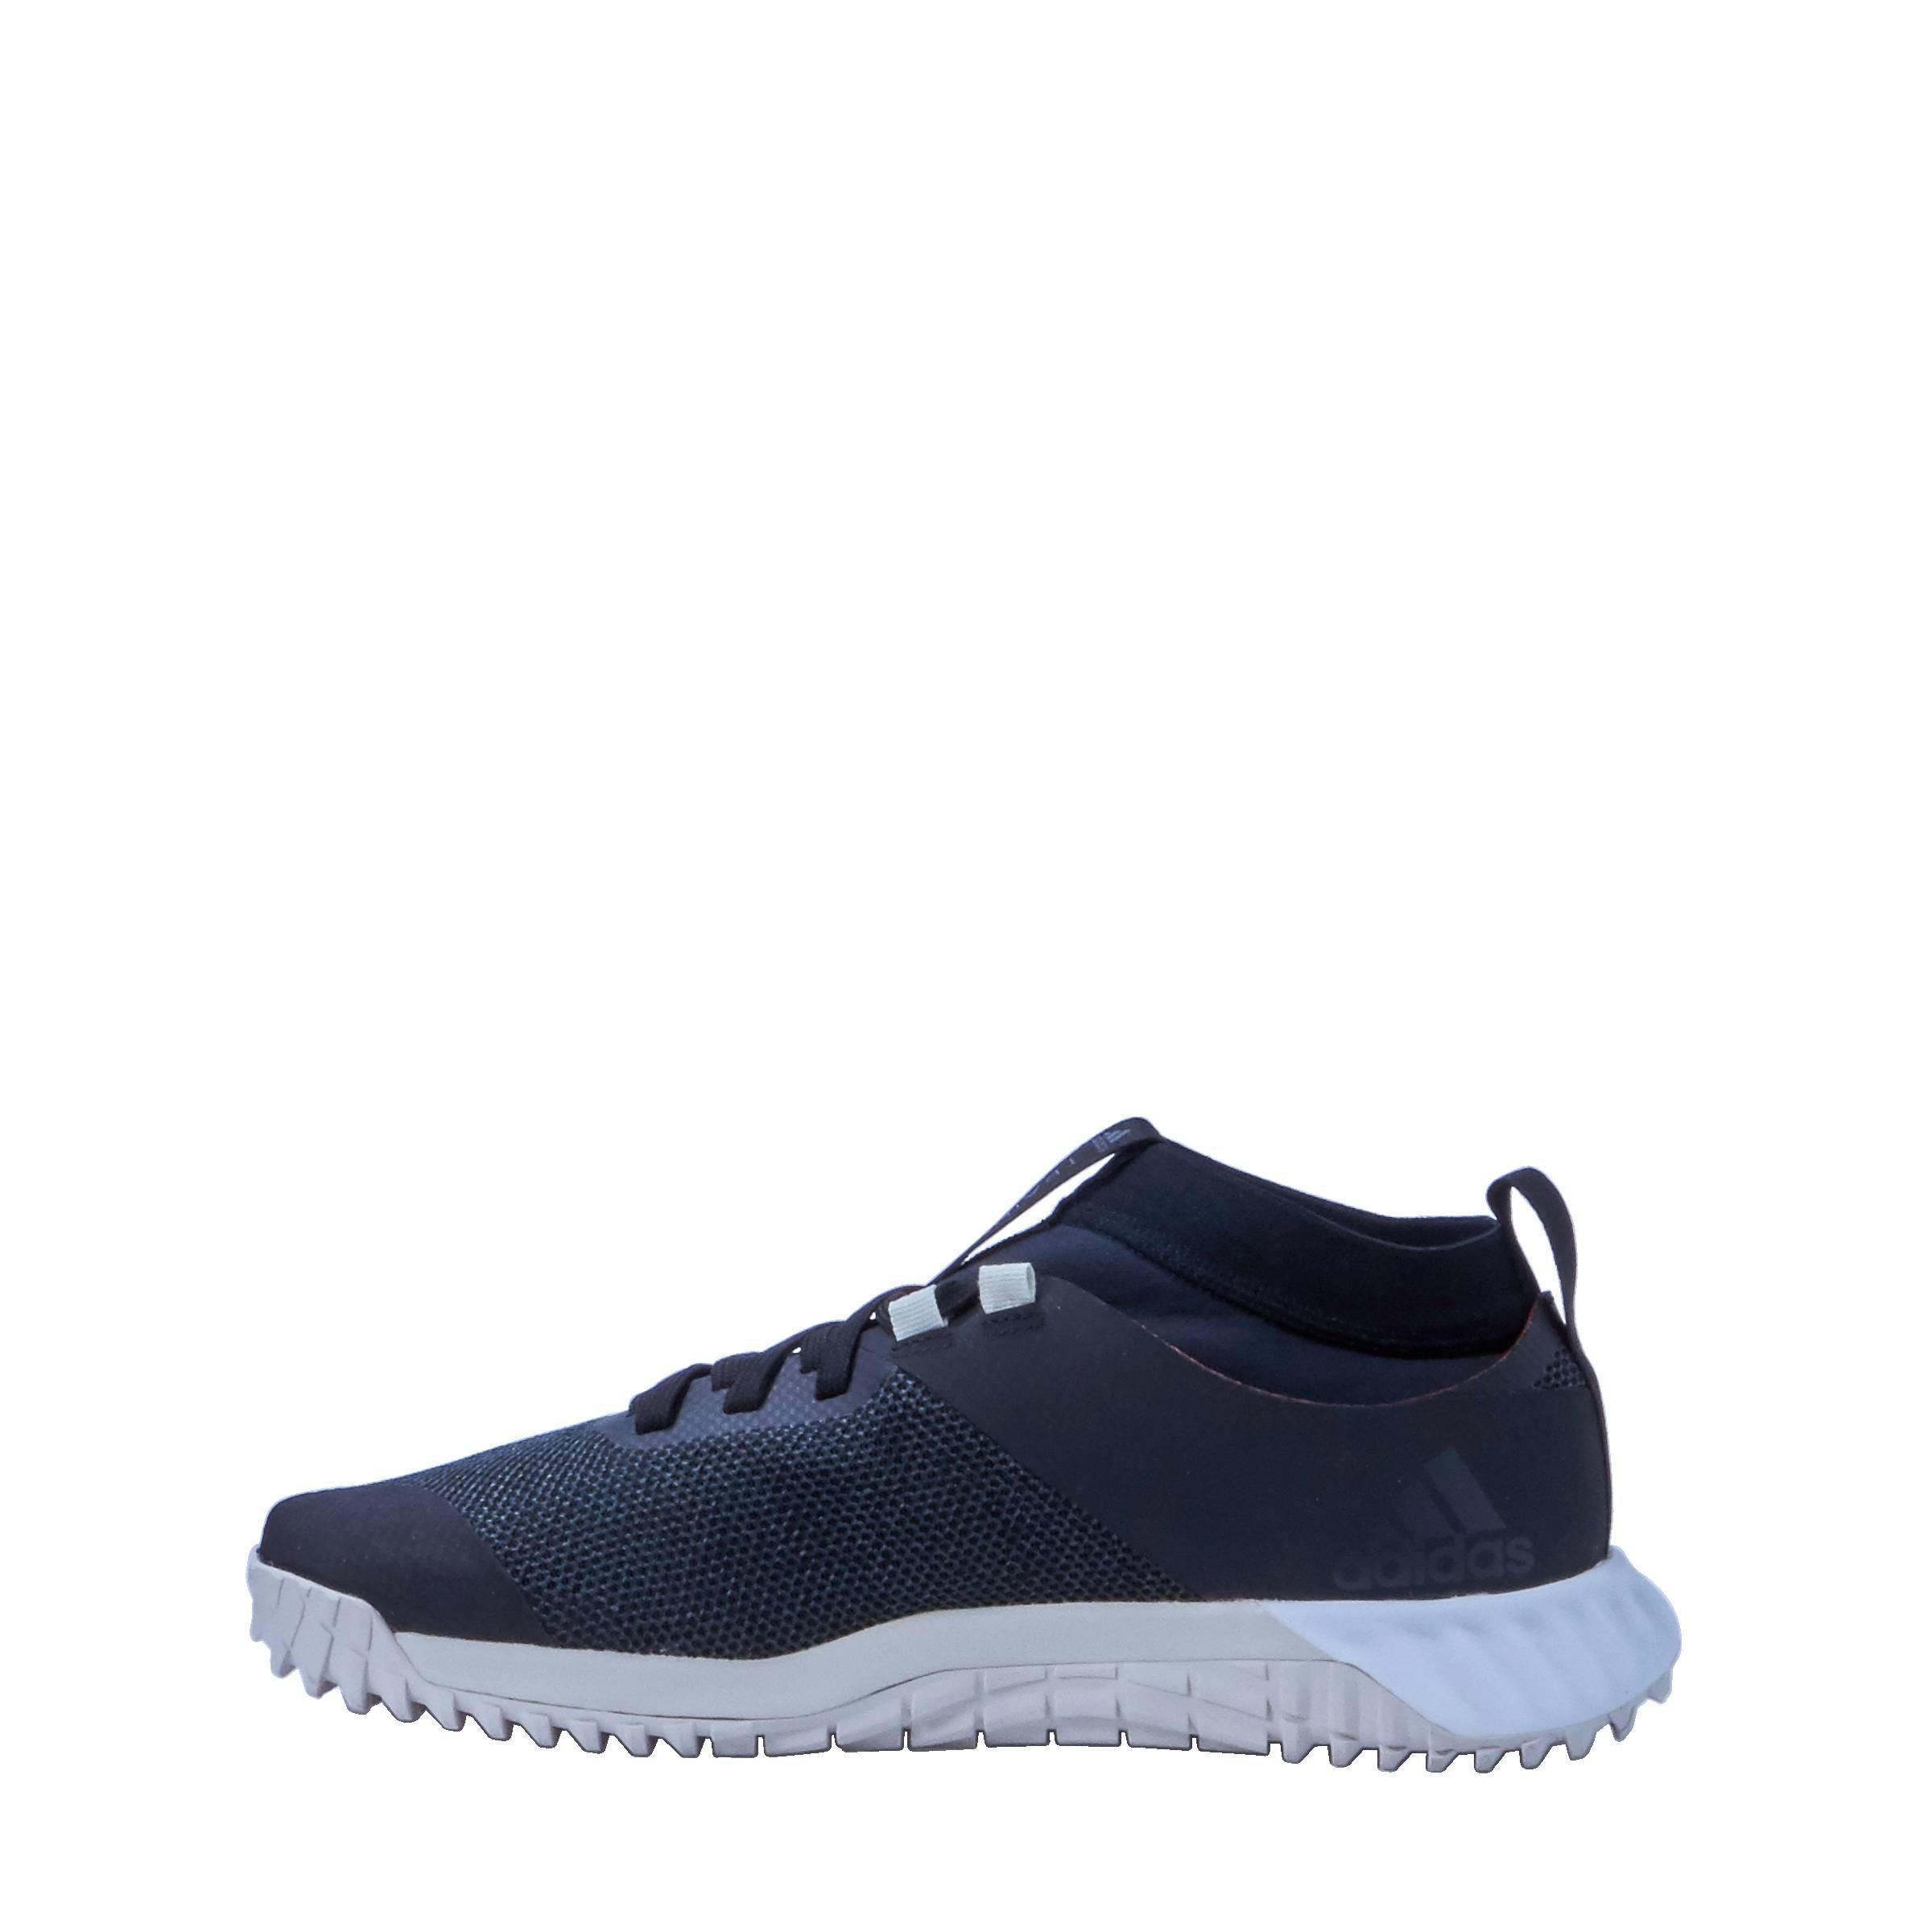 sale retailer 48ee5 c0ab3 Crazytrain Fitness Adidas 3 Performance 0 Schoenen Pro M Wehkamp HwxY5xA7q